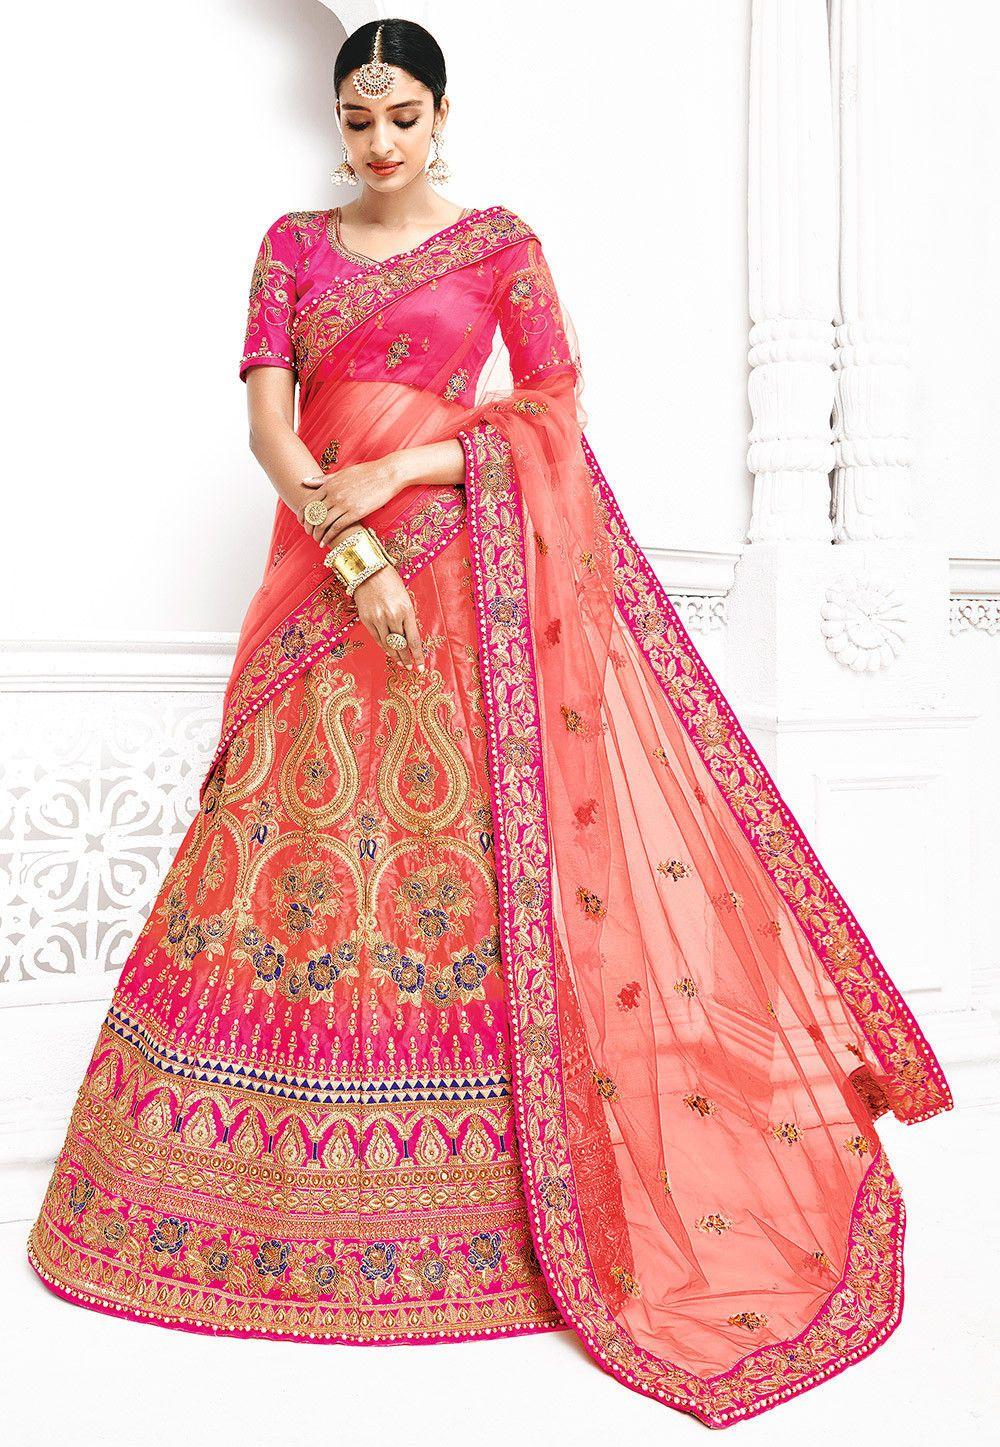 f57f3b7056 Buy Embroidered Net Lehenga Style Saree in Dark Peach online, Item code:  SPFA2173, Color: Pink, Occasion: Wedding, Bridal, Work: Bead Work, Resham,  ...